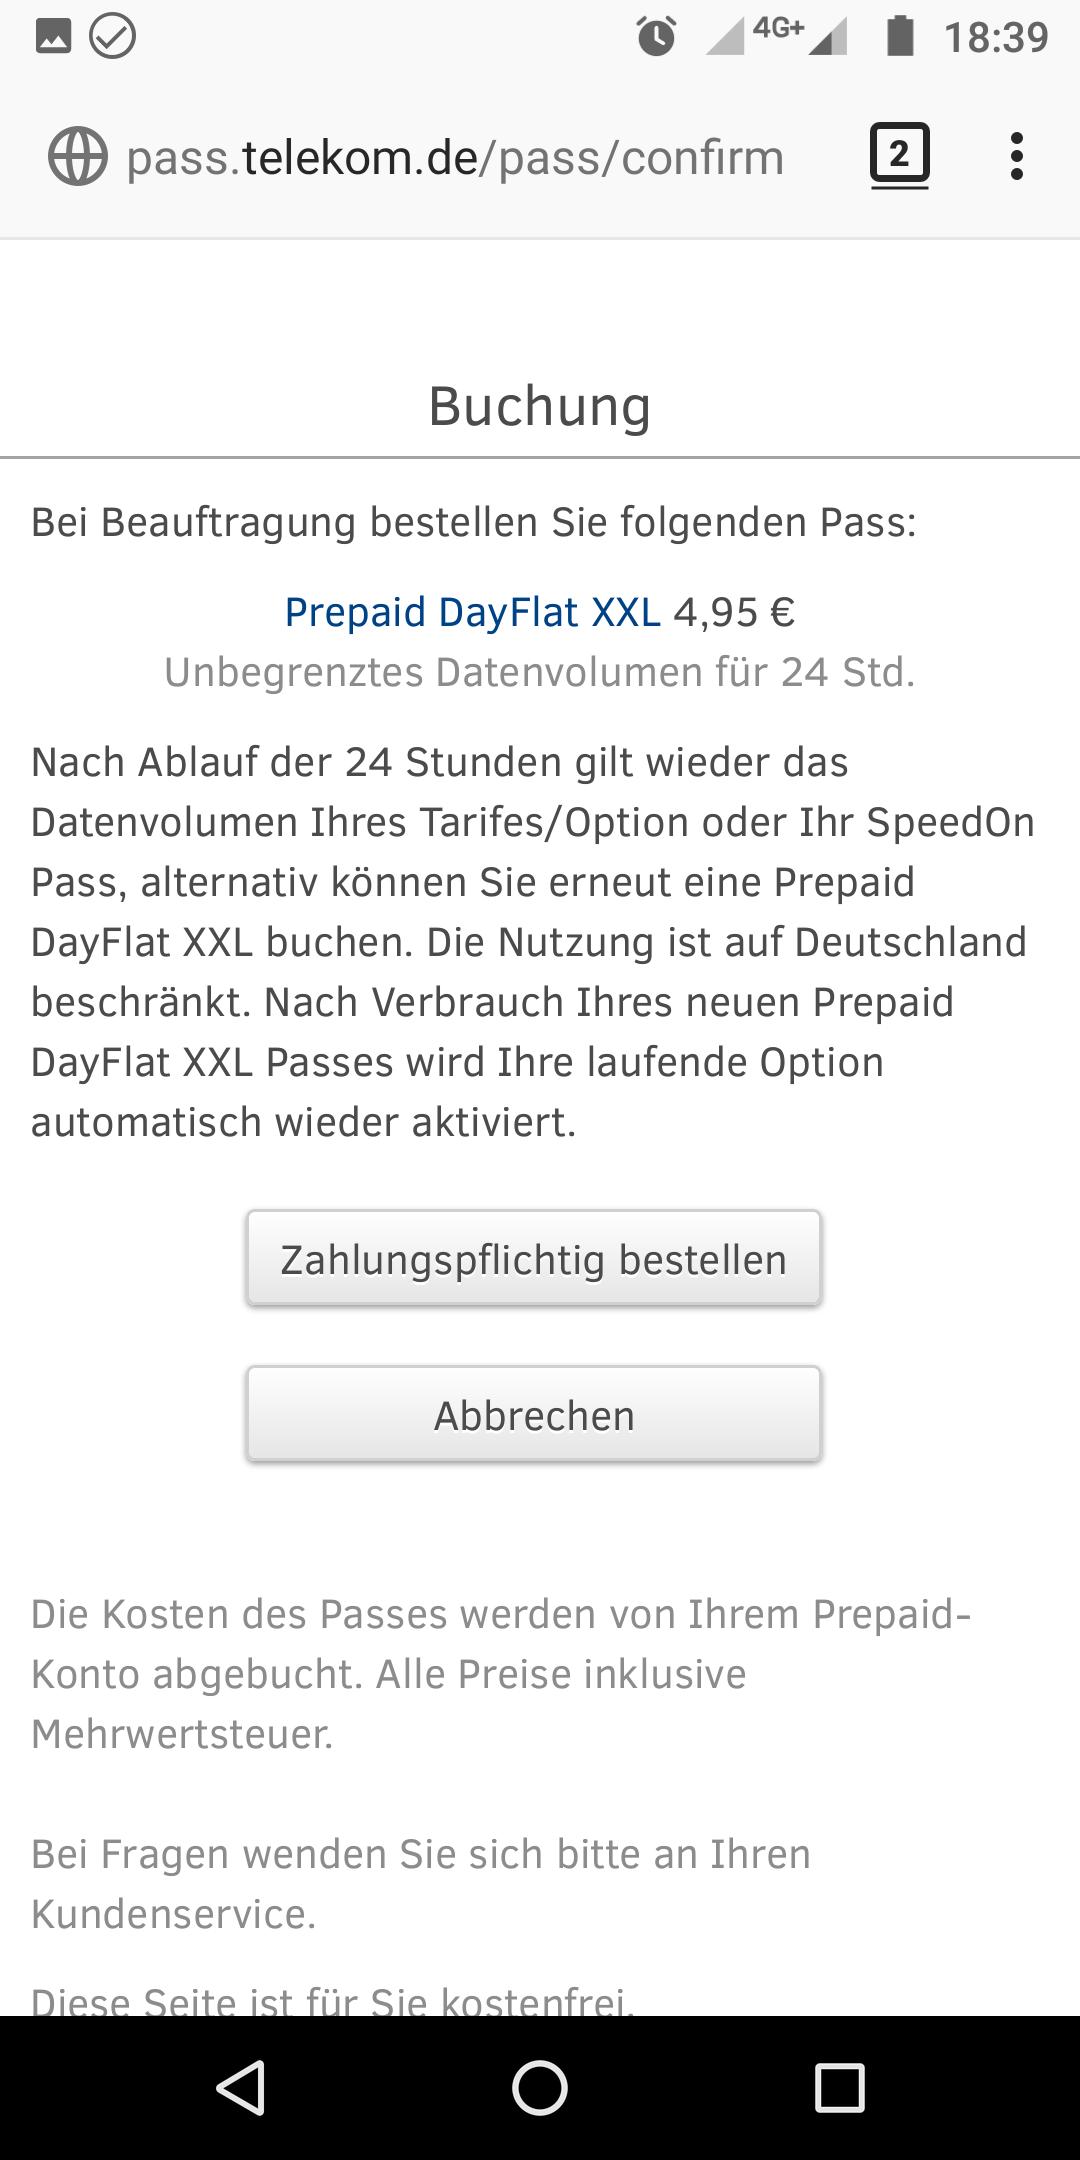 Prepaid Dayflat Xxl